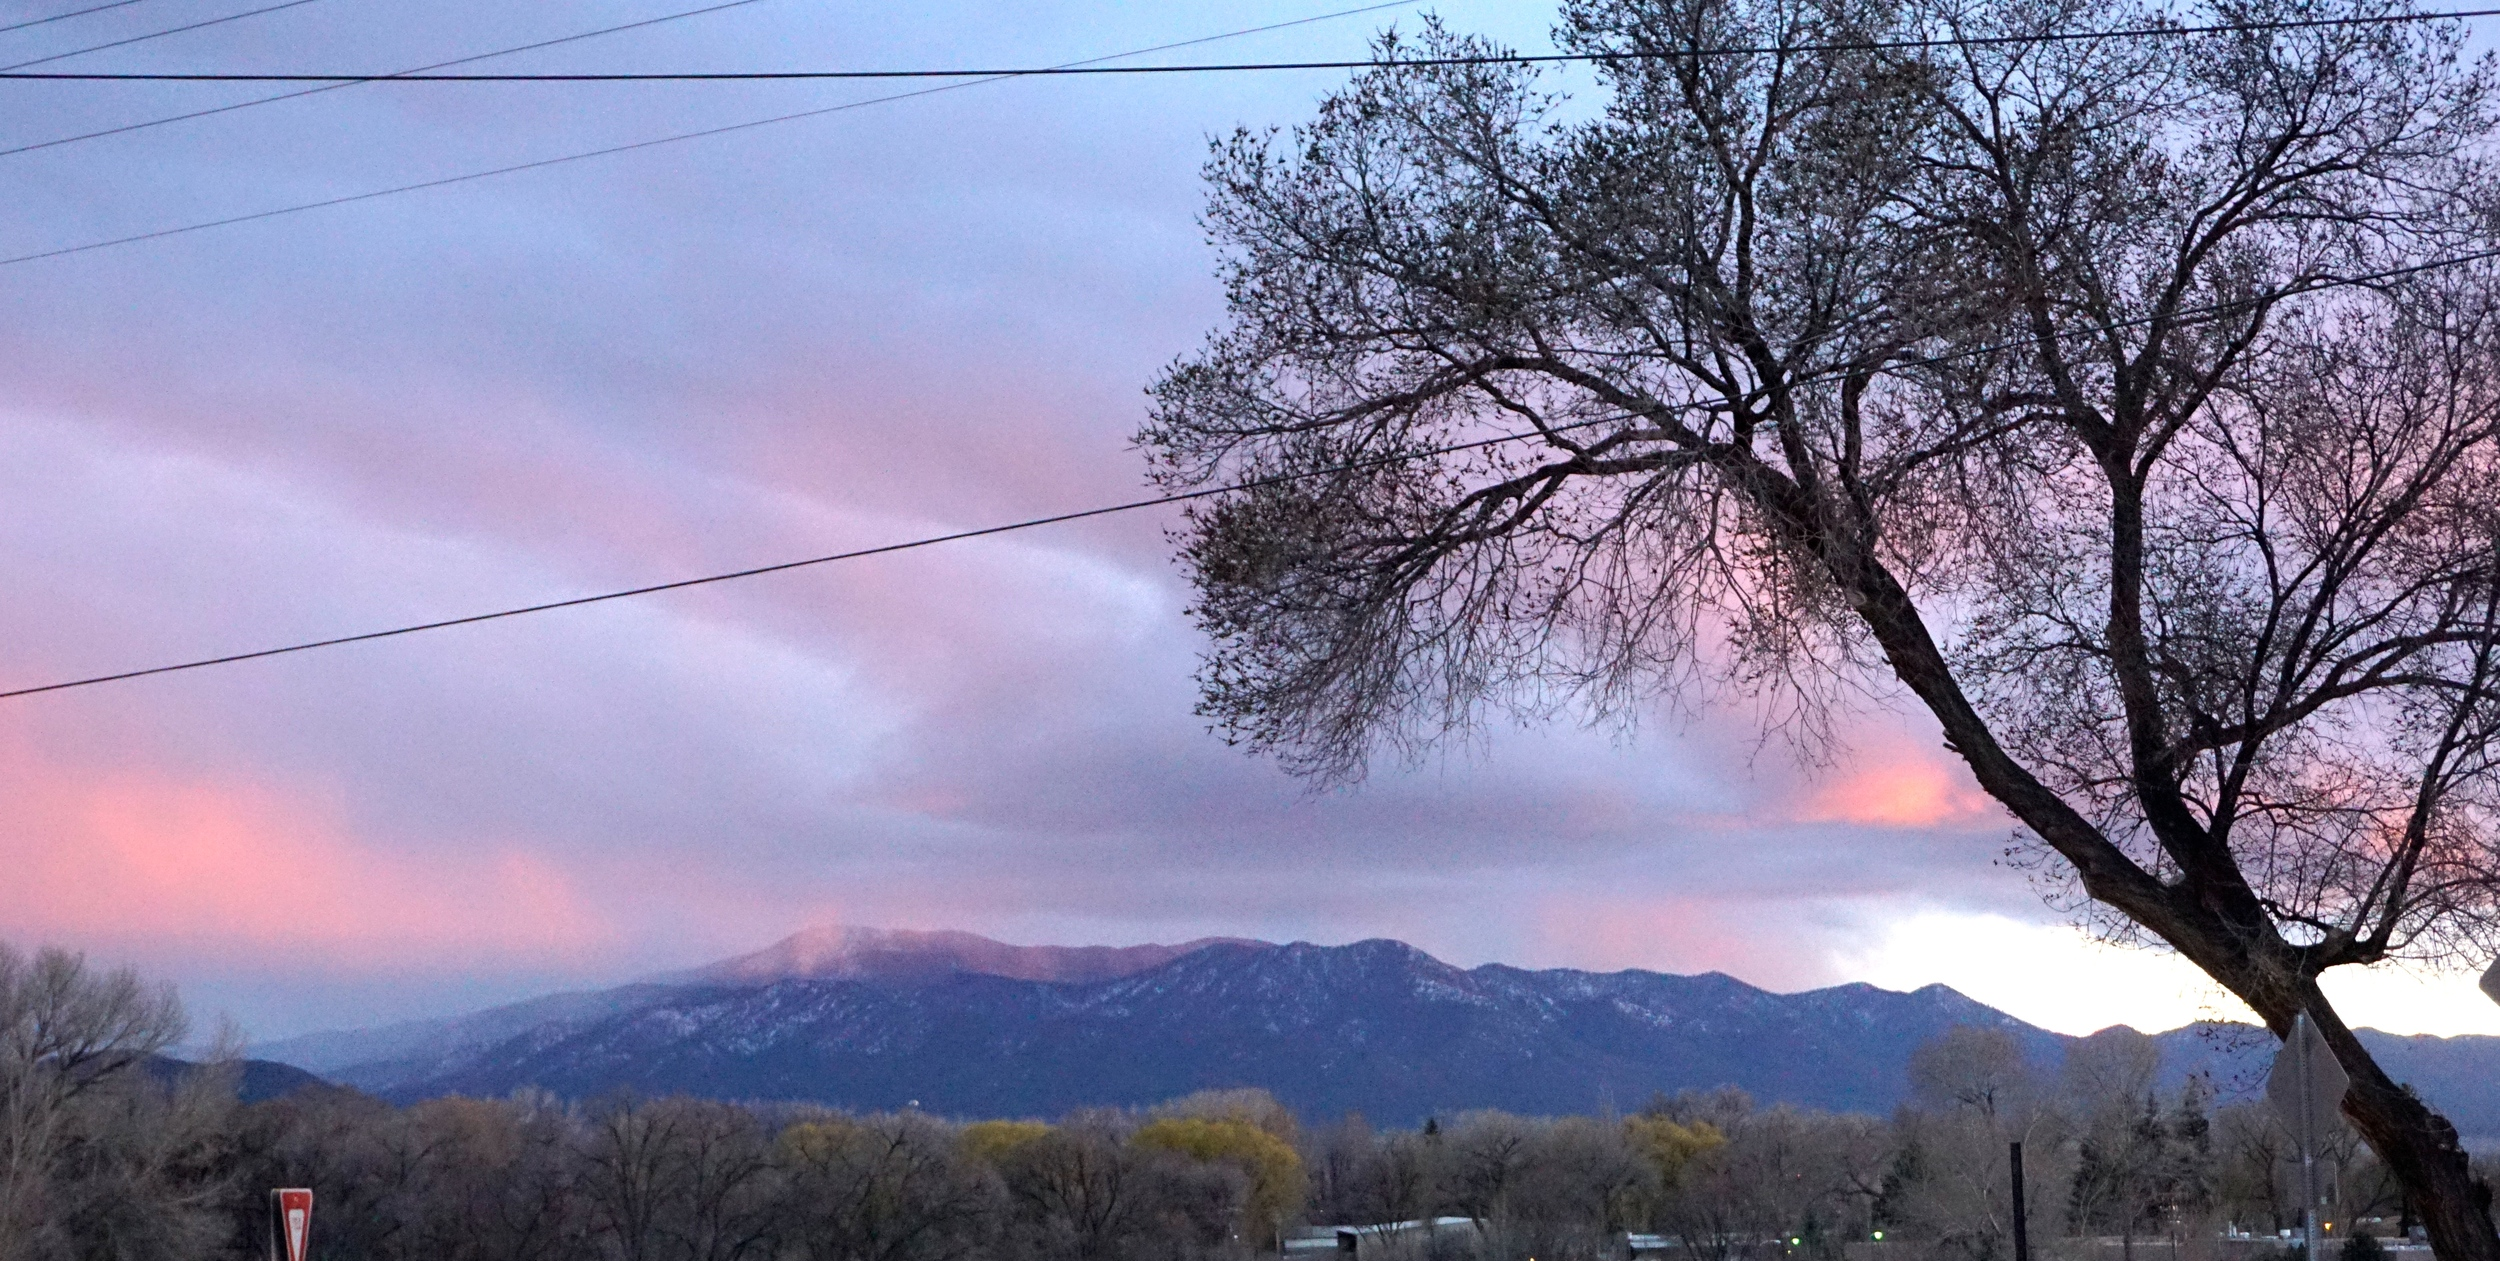 Taos sunsets